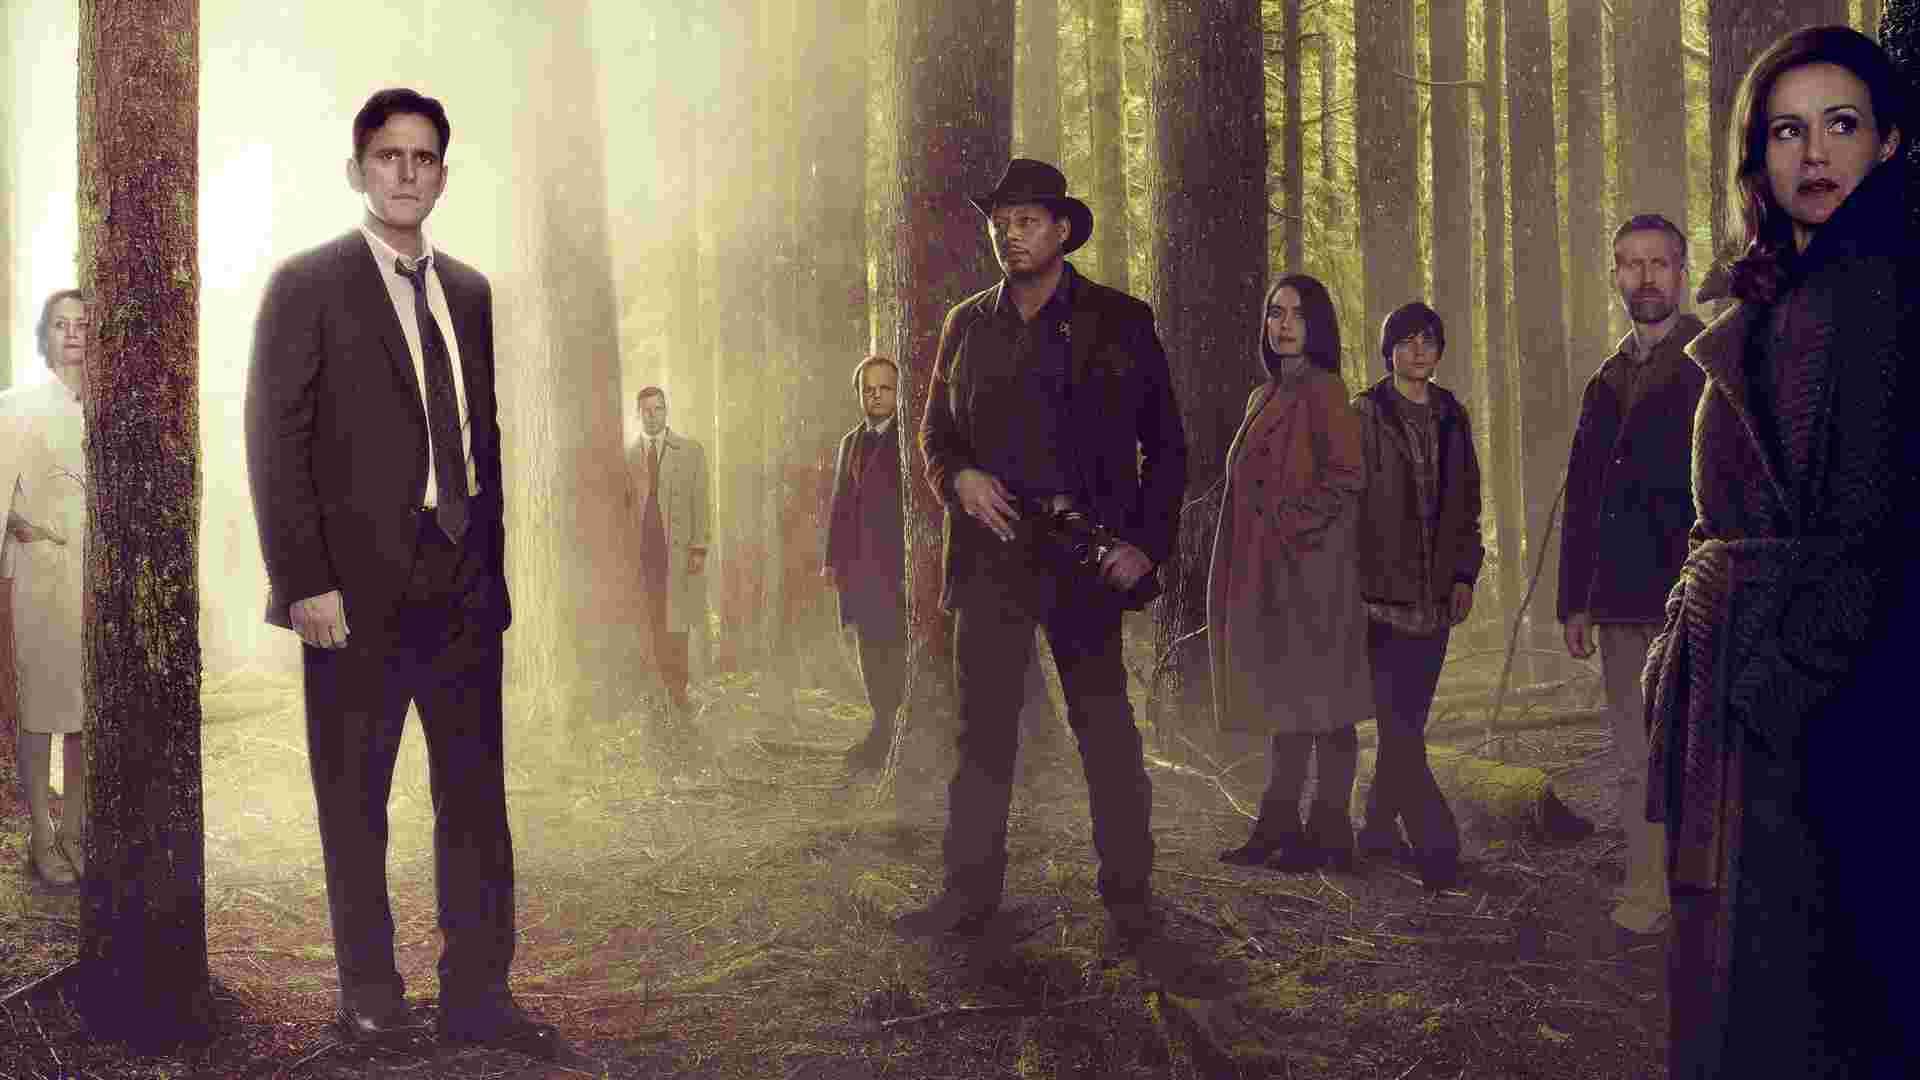 Wayward-Pines-2015-TV-Series-Cast-HD-Wallpaper